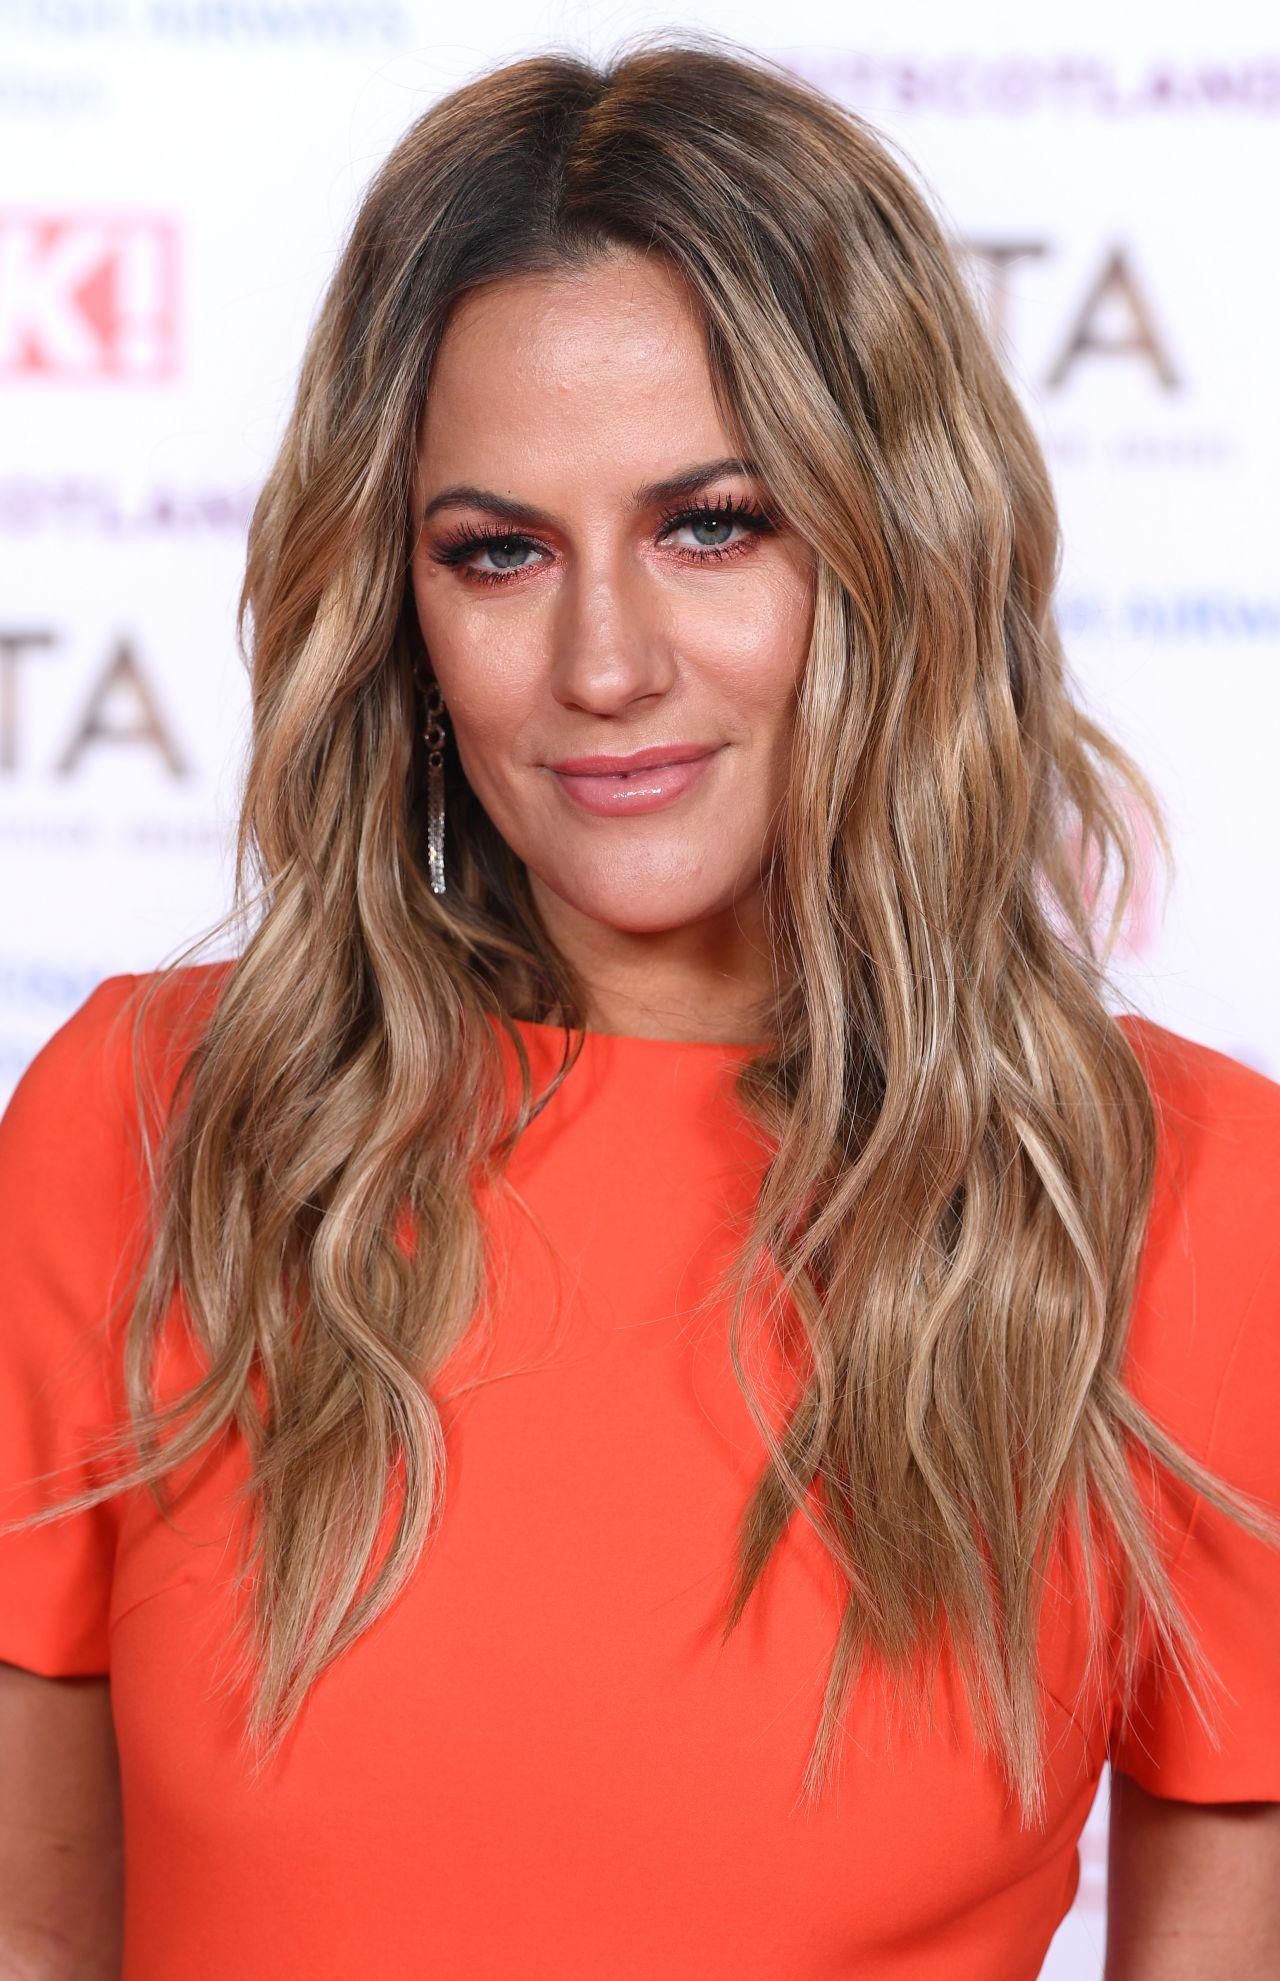 Caroline Flack Hairstyle 2020 Blonde Hair 5